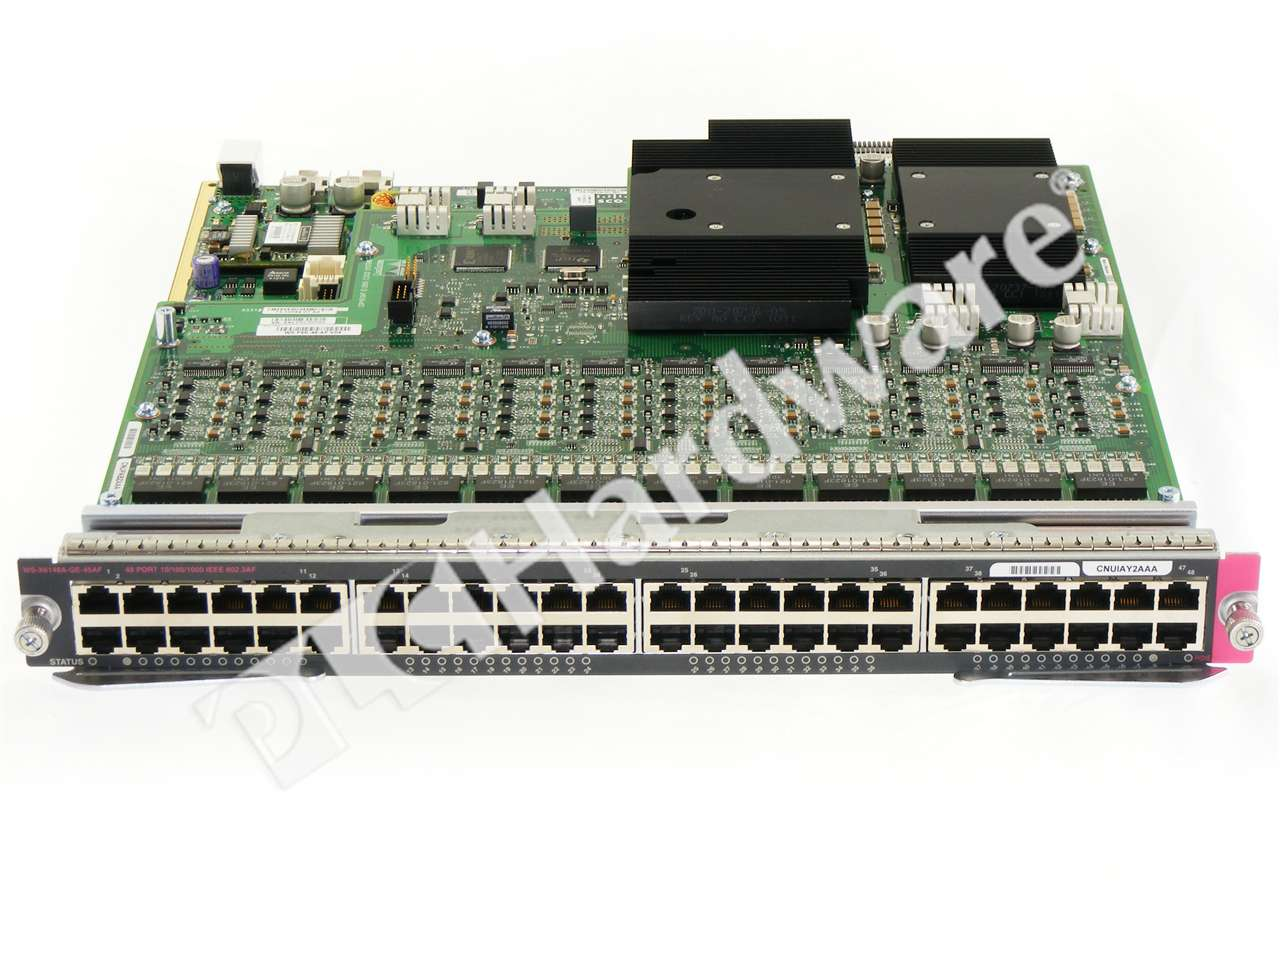 Cisco WS-F6K-48-AF-RF Power injector WS-X6148A-RJ-45 WS-X6148A-RJ-45-RF WS-X6148A-GE-TX-RF for P//N: WS-X6148A-GE-TX refurbished